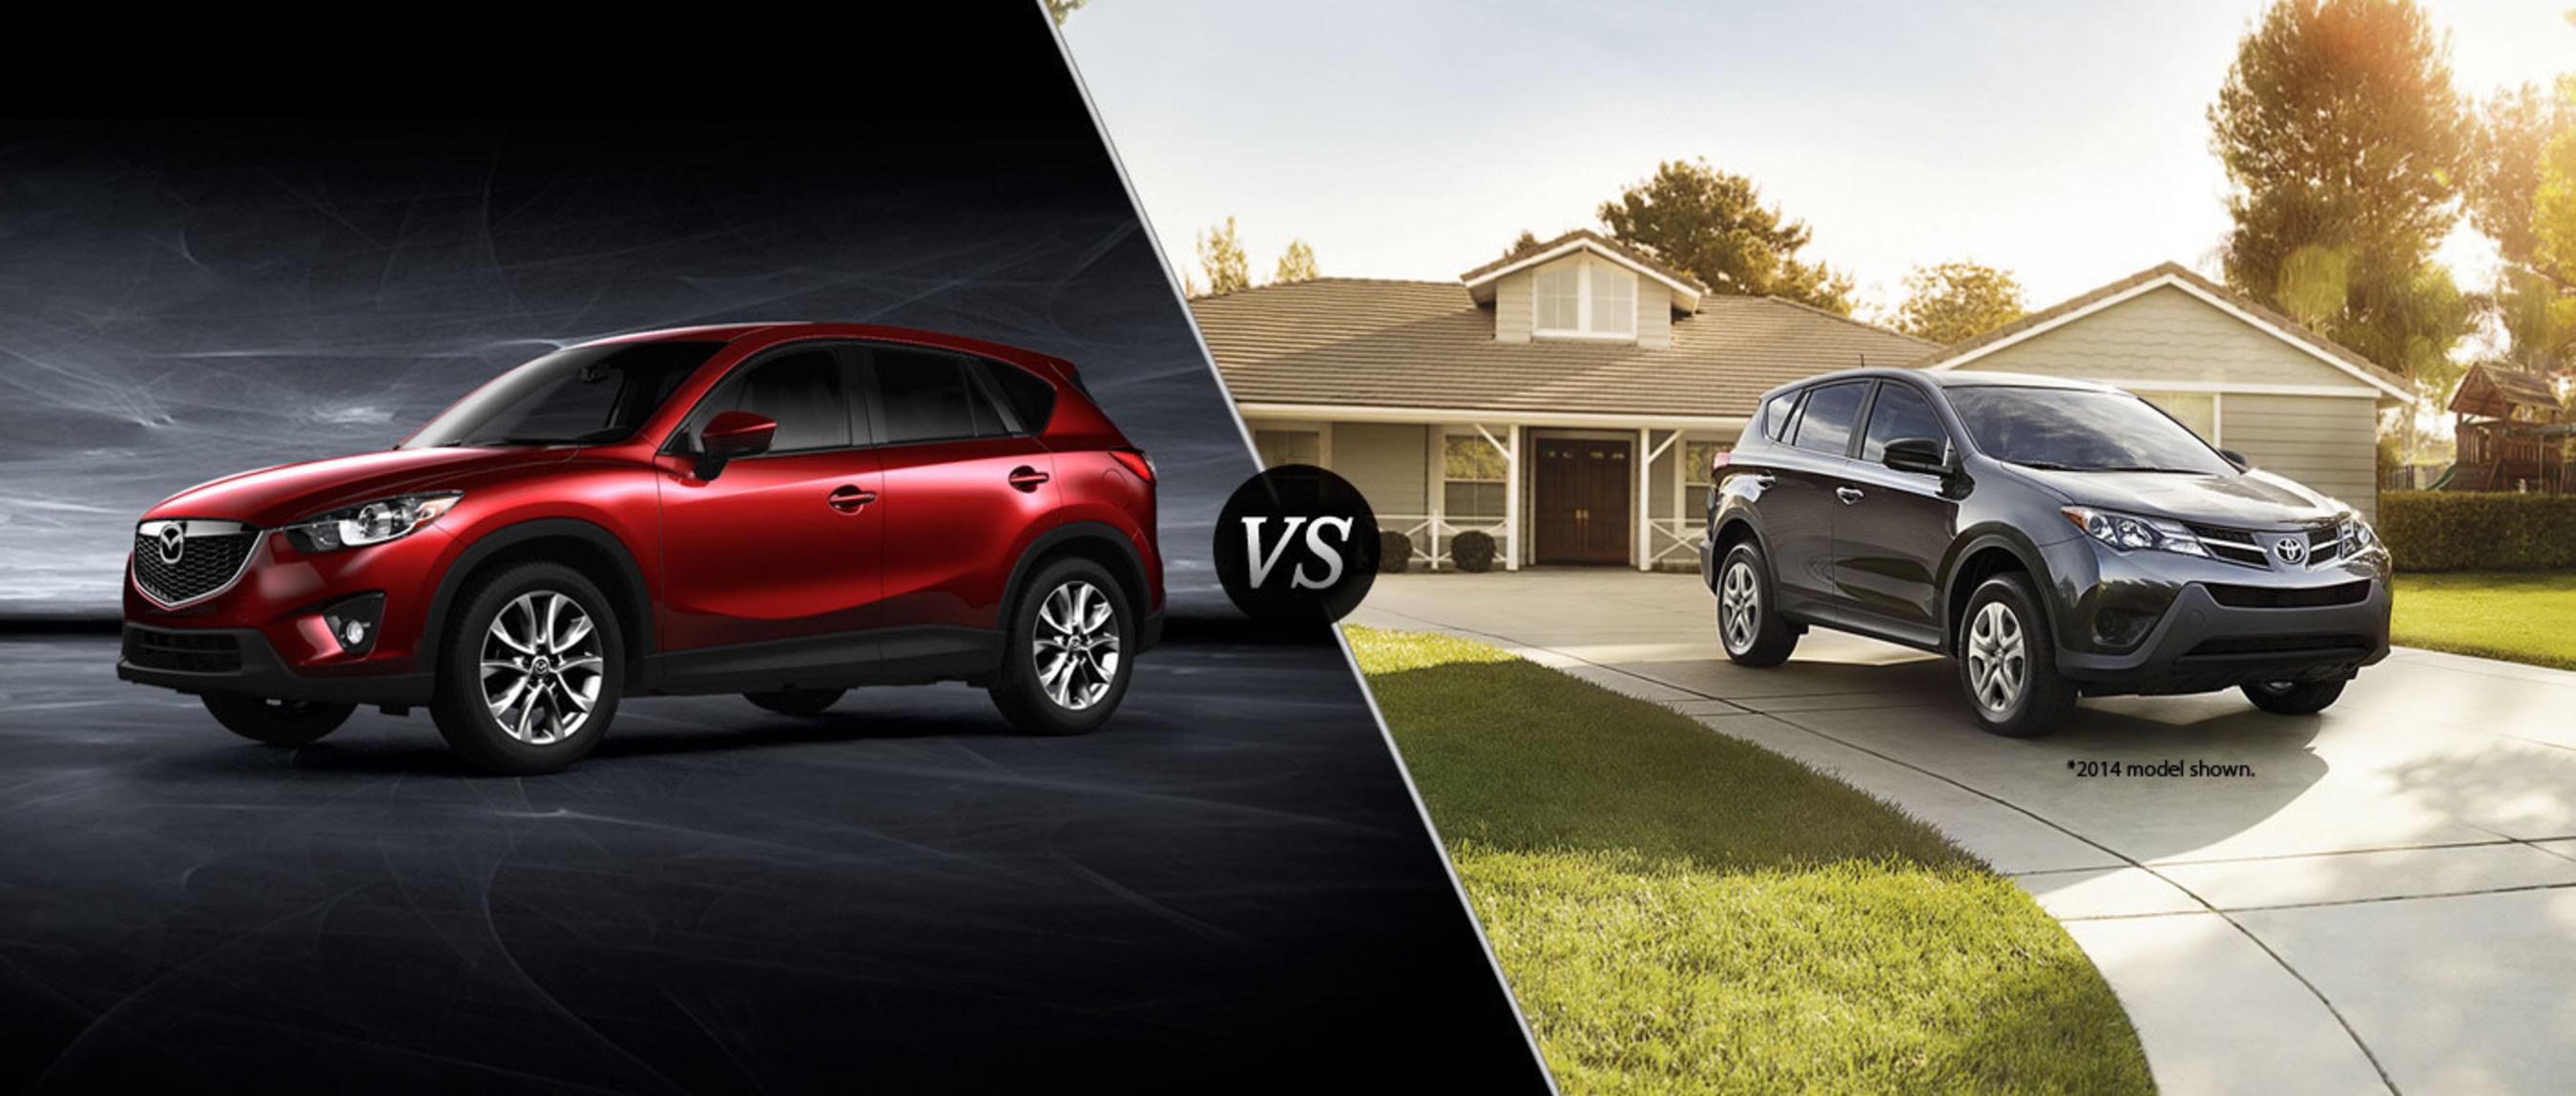 Dayton dealership compares popular Mazda vehicles to competitors